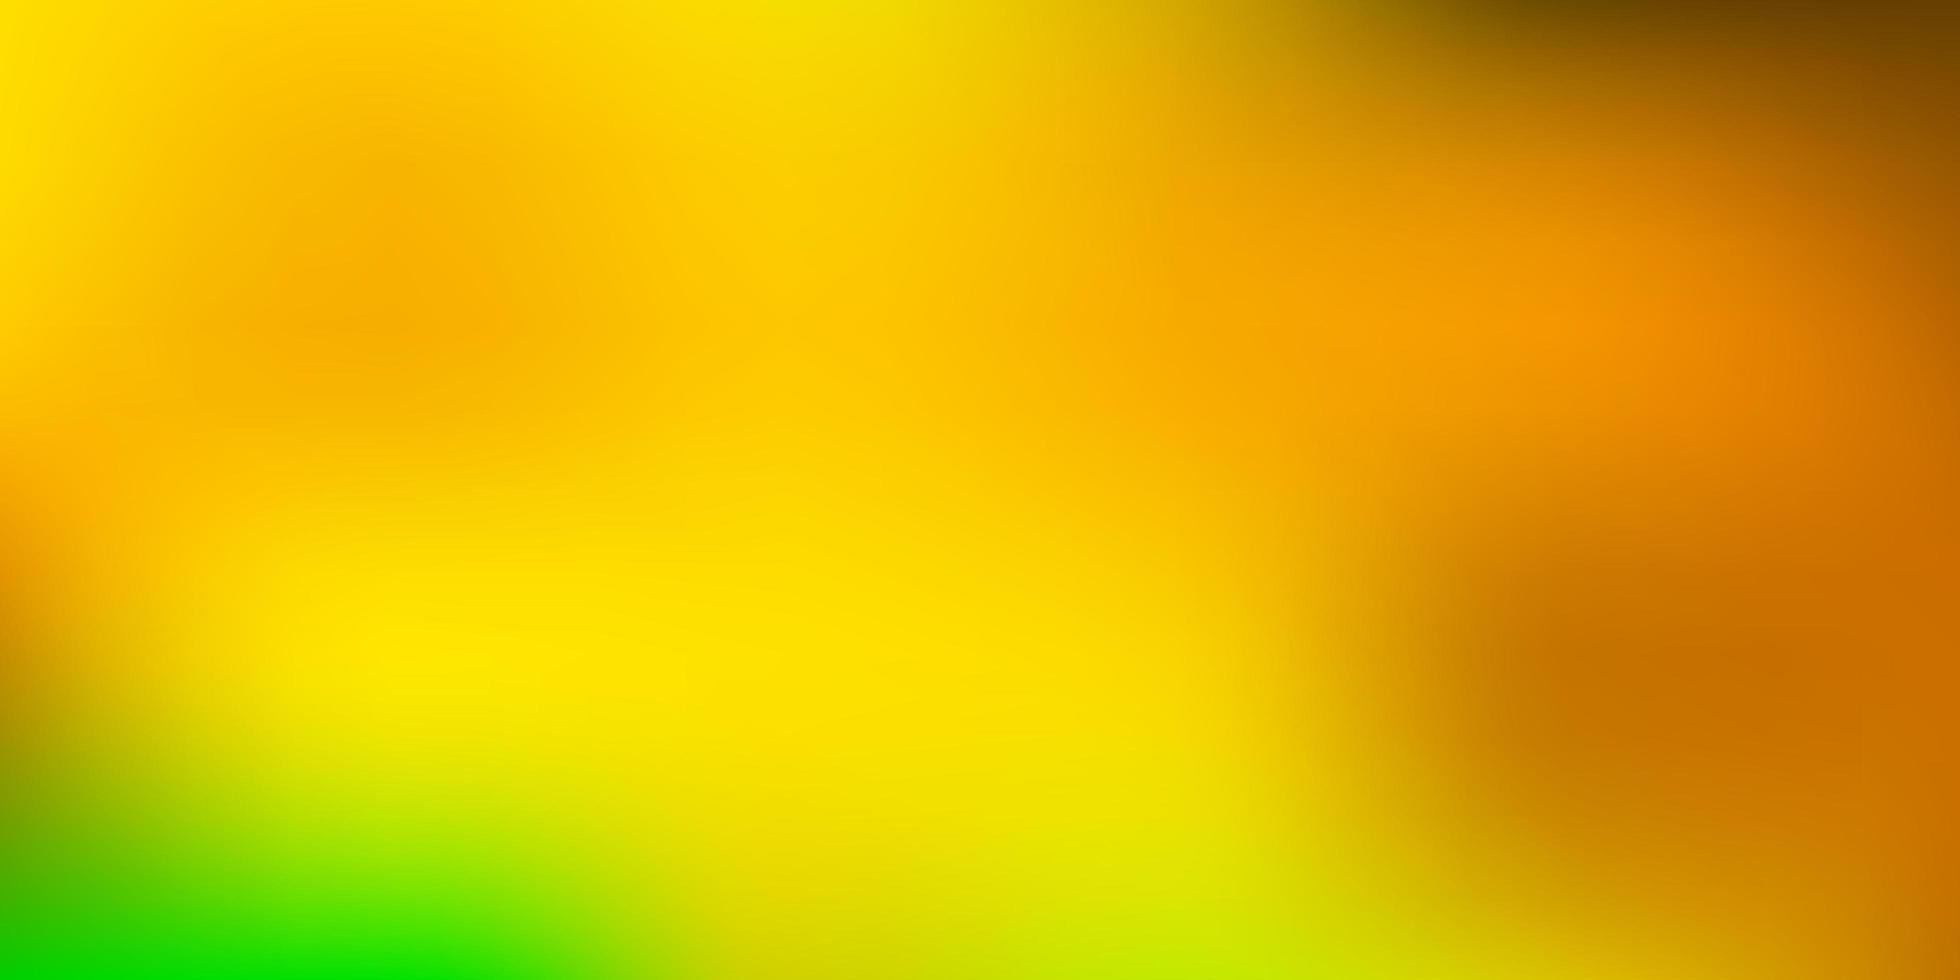 mörkgrön, gul vektor suddig konsistens.